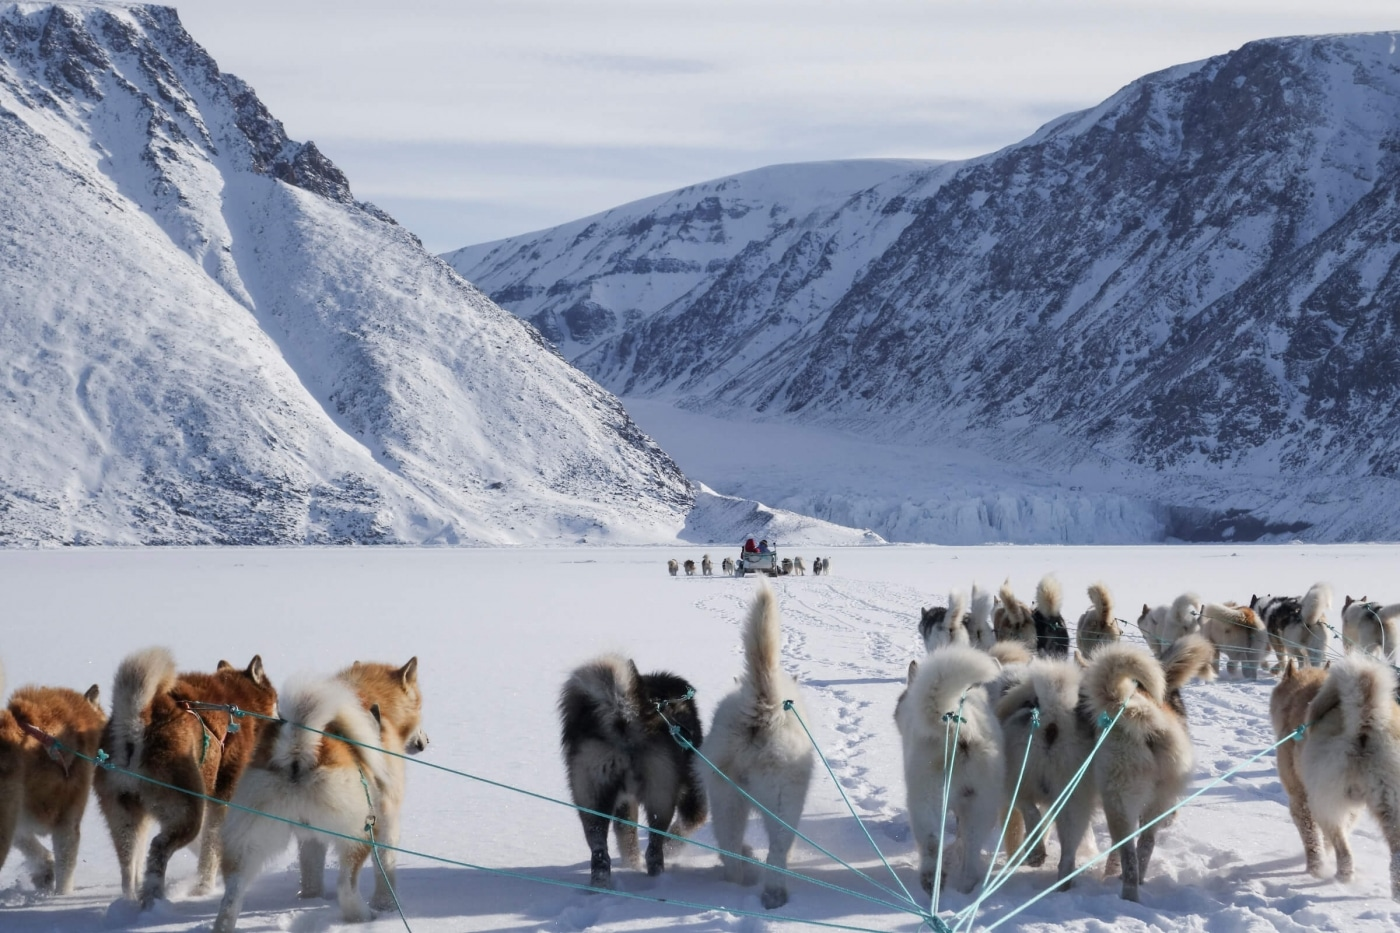 Running Dogs. Photo by Kim Insuk